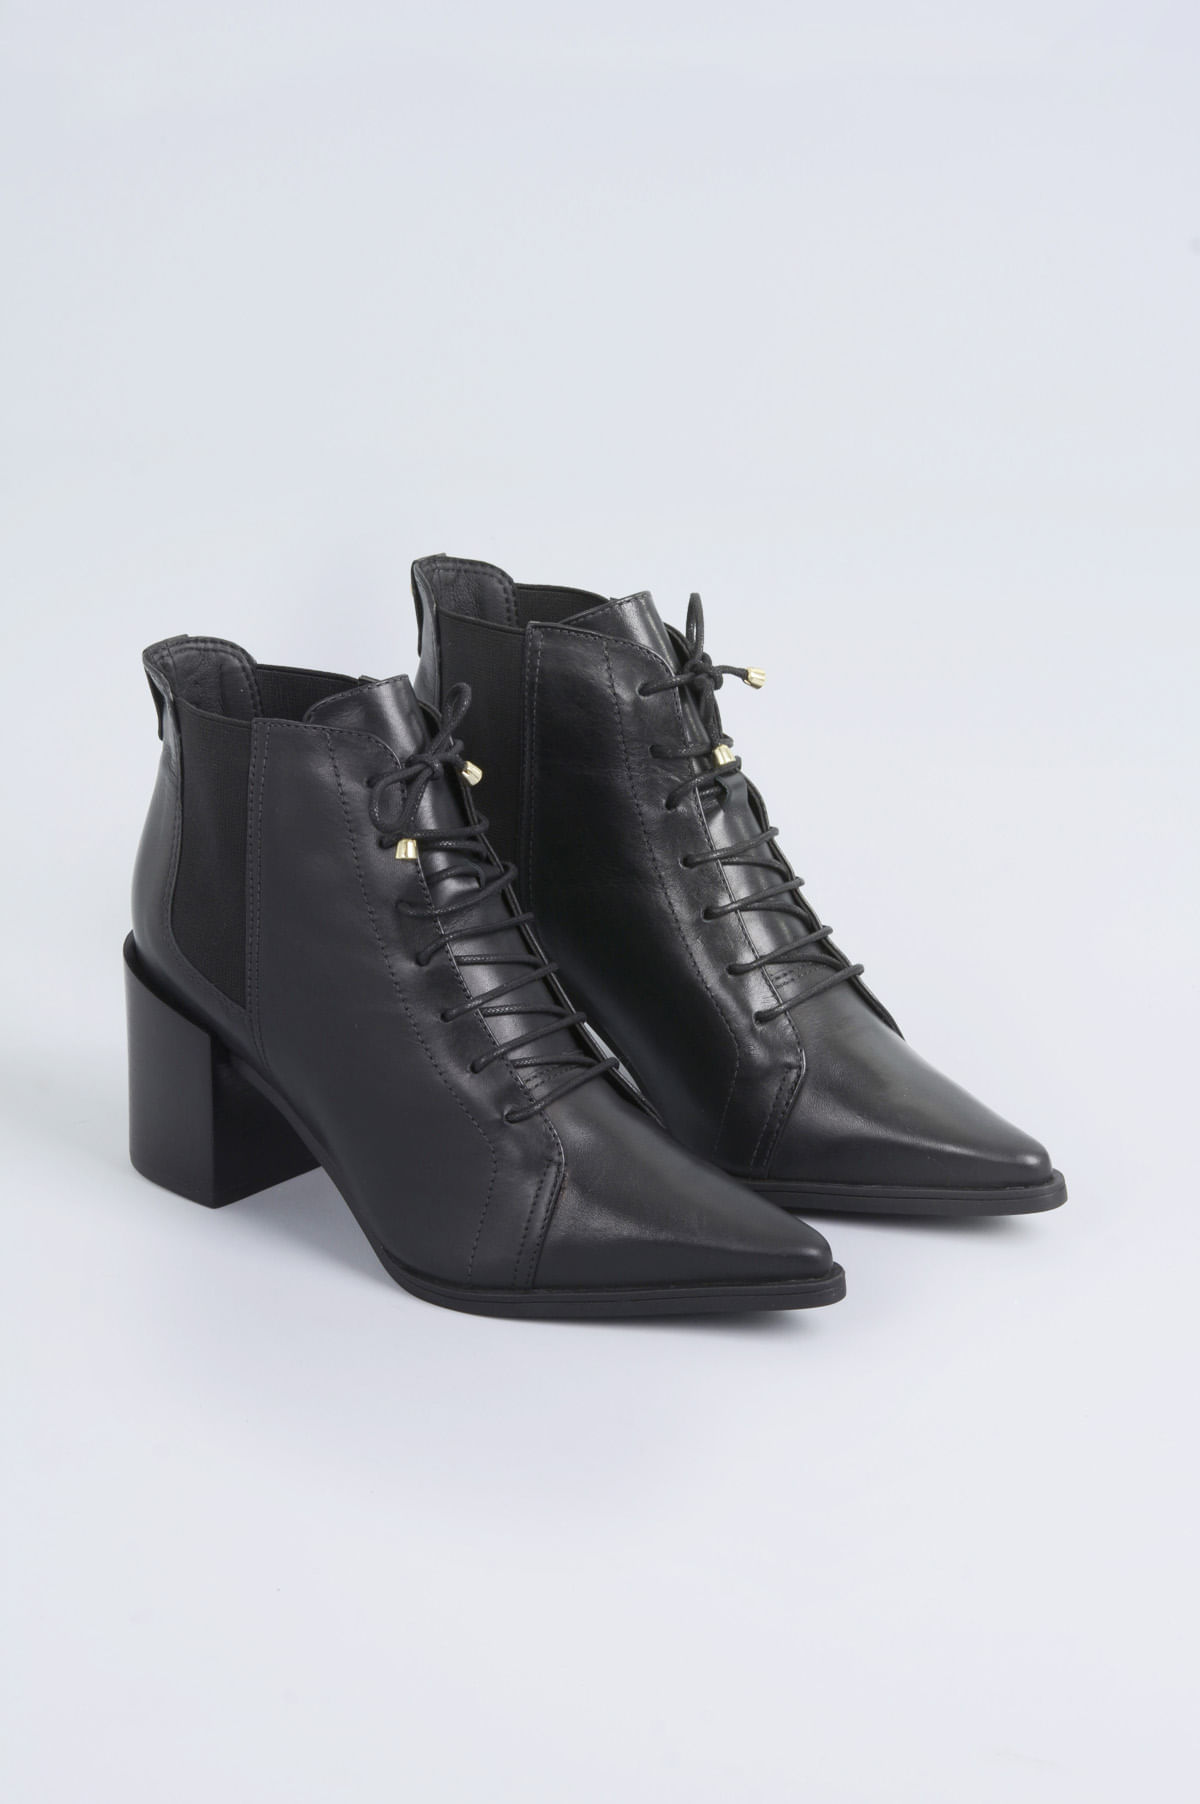 6344a578f6c2c Ankle Boot Salto Alto Aeryn Bottero CR-PRETO - Mundial Calçados